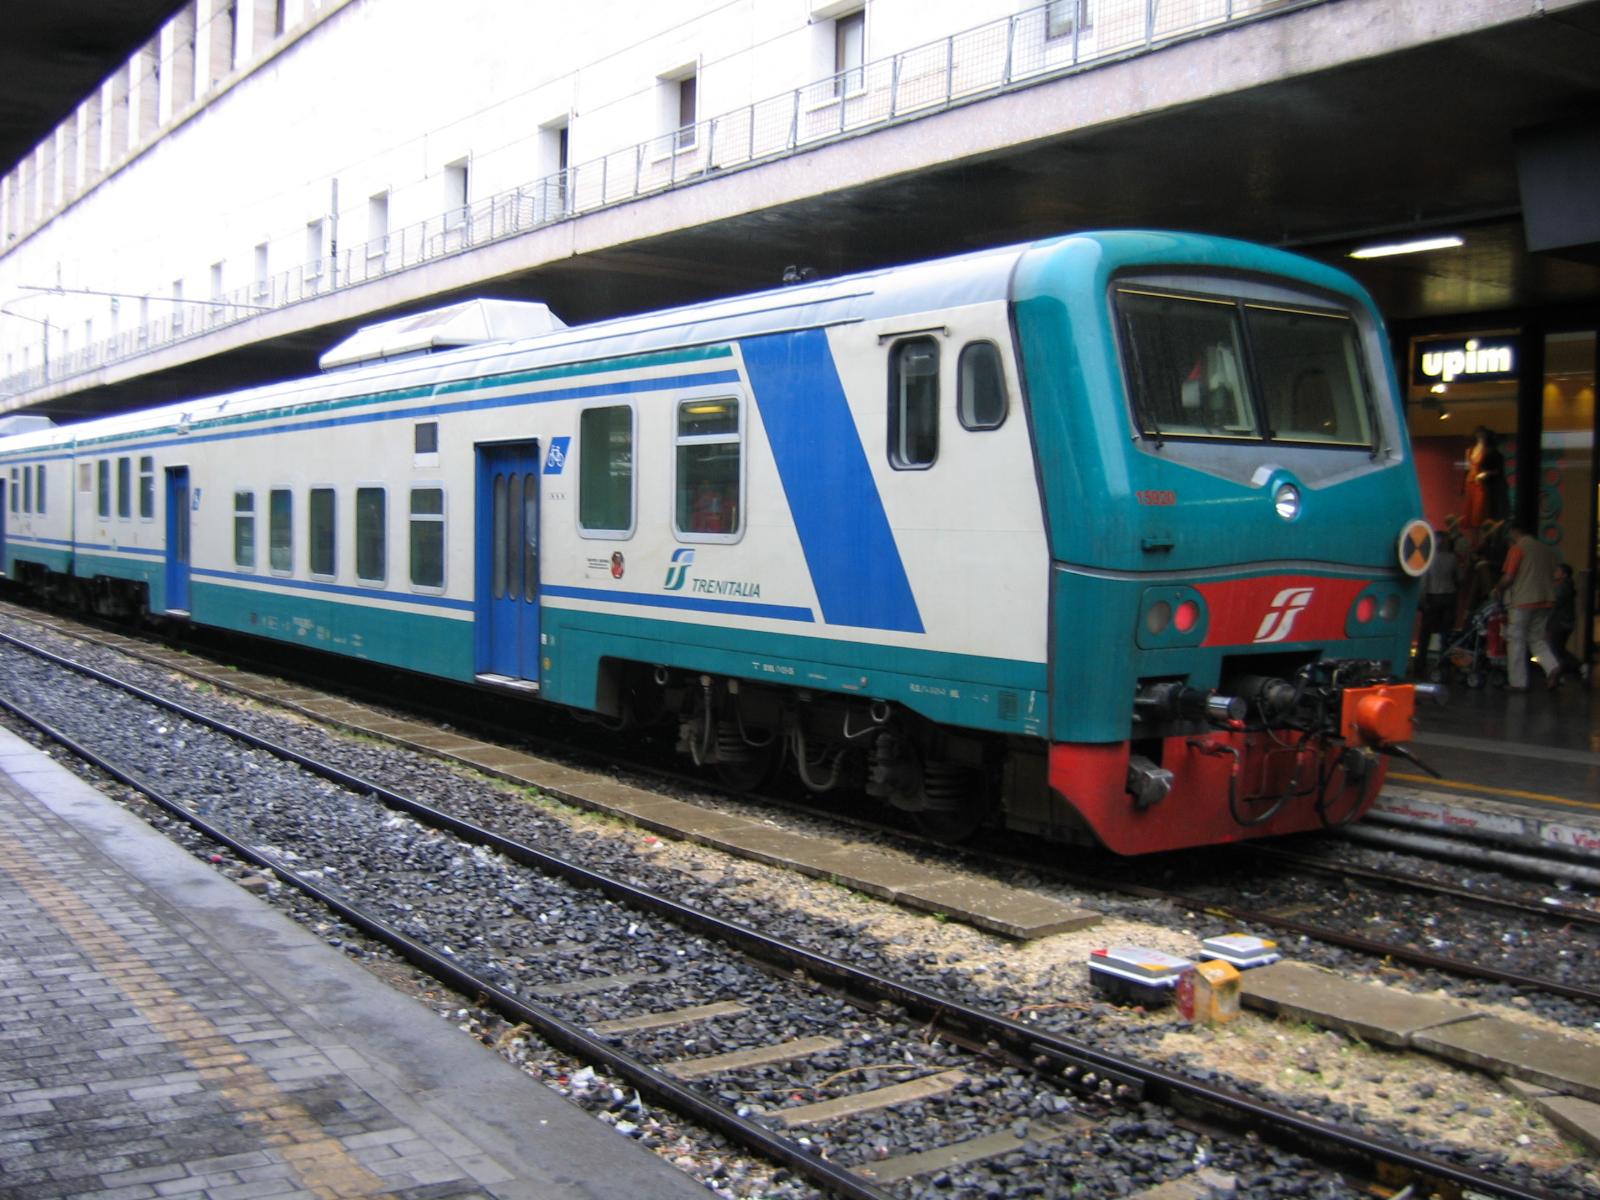 Per i pendolari dell'Emilia Romagna...Maggio gratis!